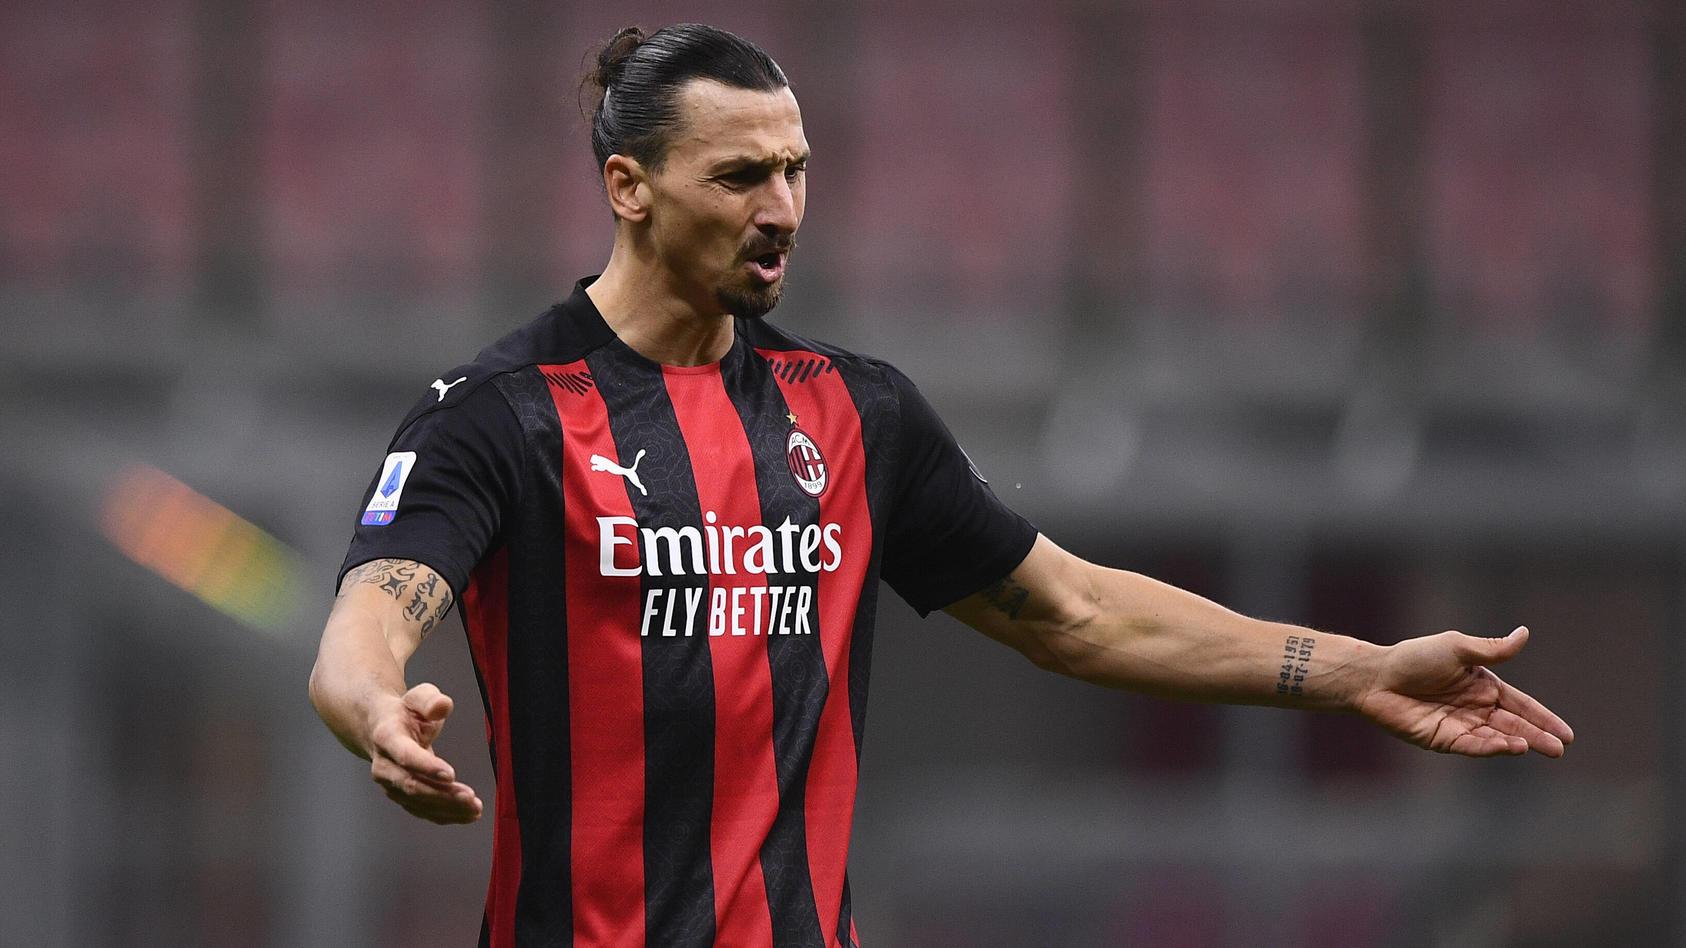 Zlatan Ibrahimovic im Trikot des AC Mailand.